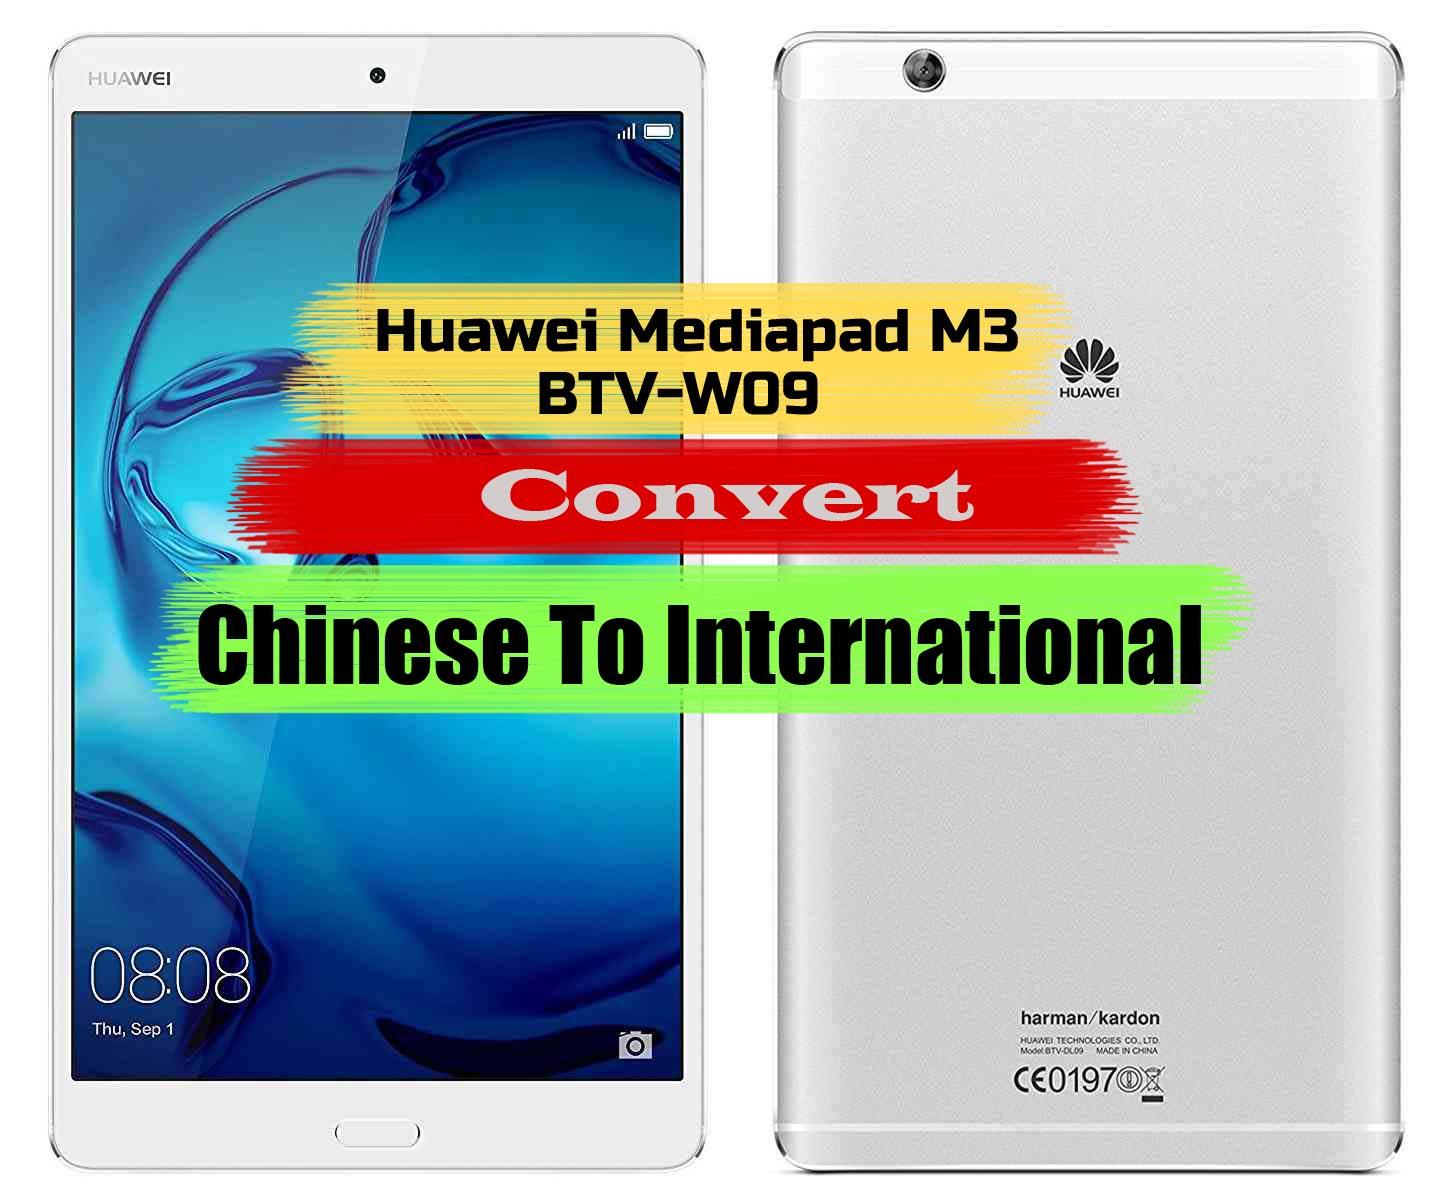 Huawei Mediapad M3 BTV-W09 Convert Chinese To International Model